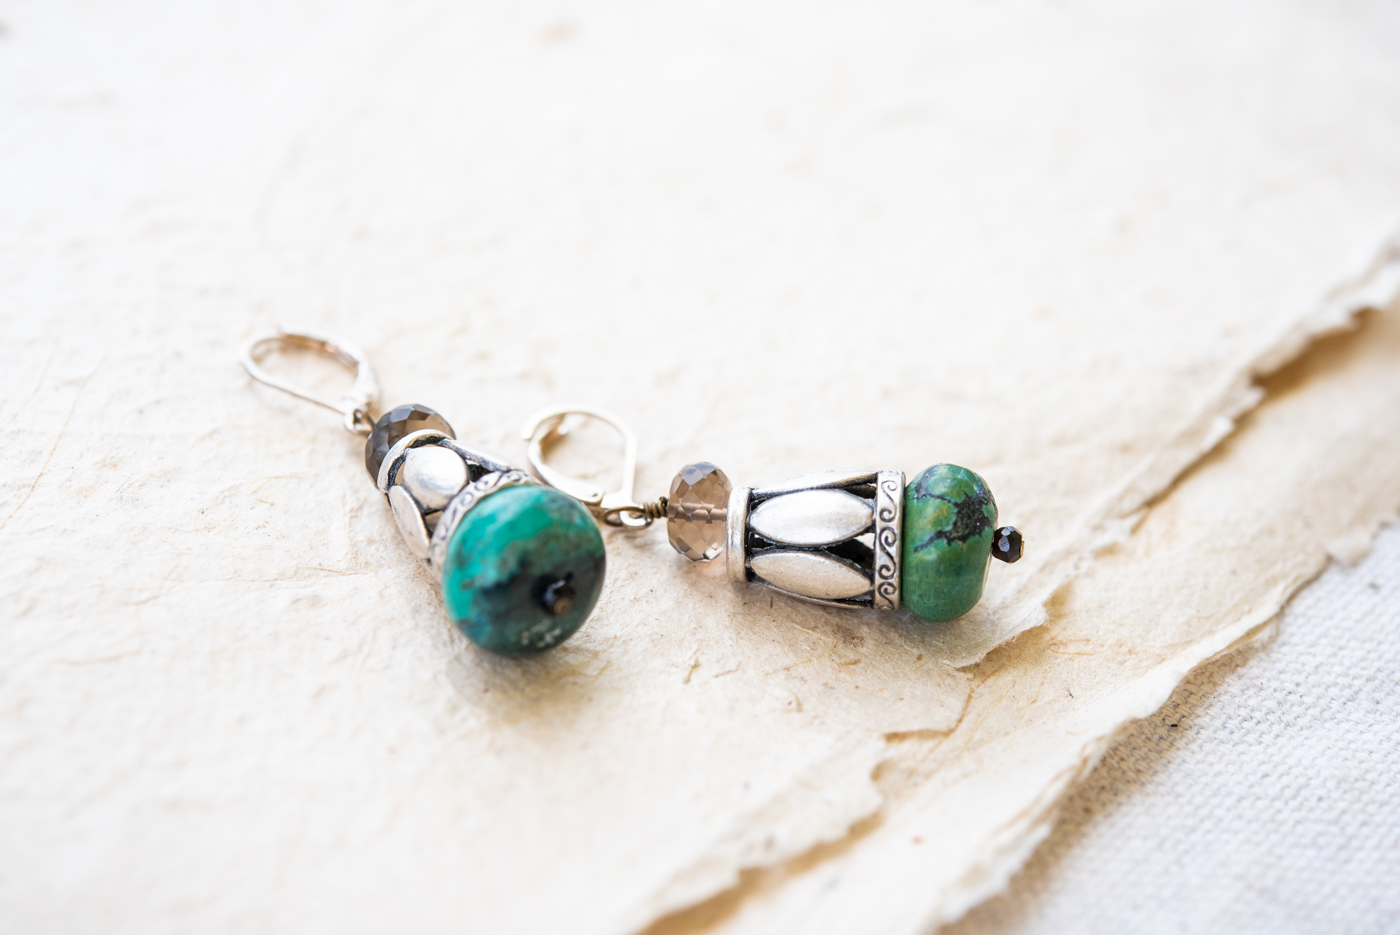 Turquoise and Smoky Quartz Dangle Earrings